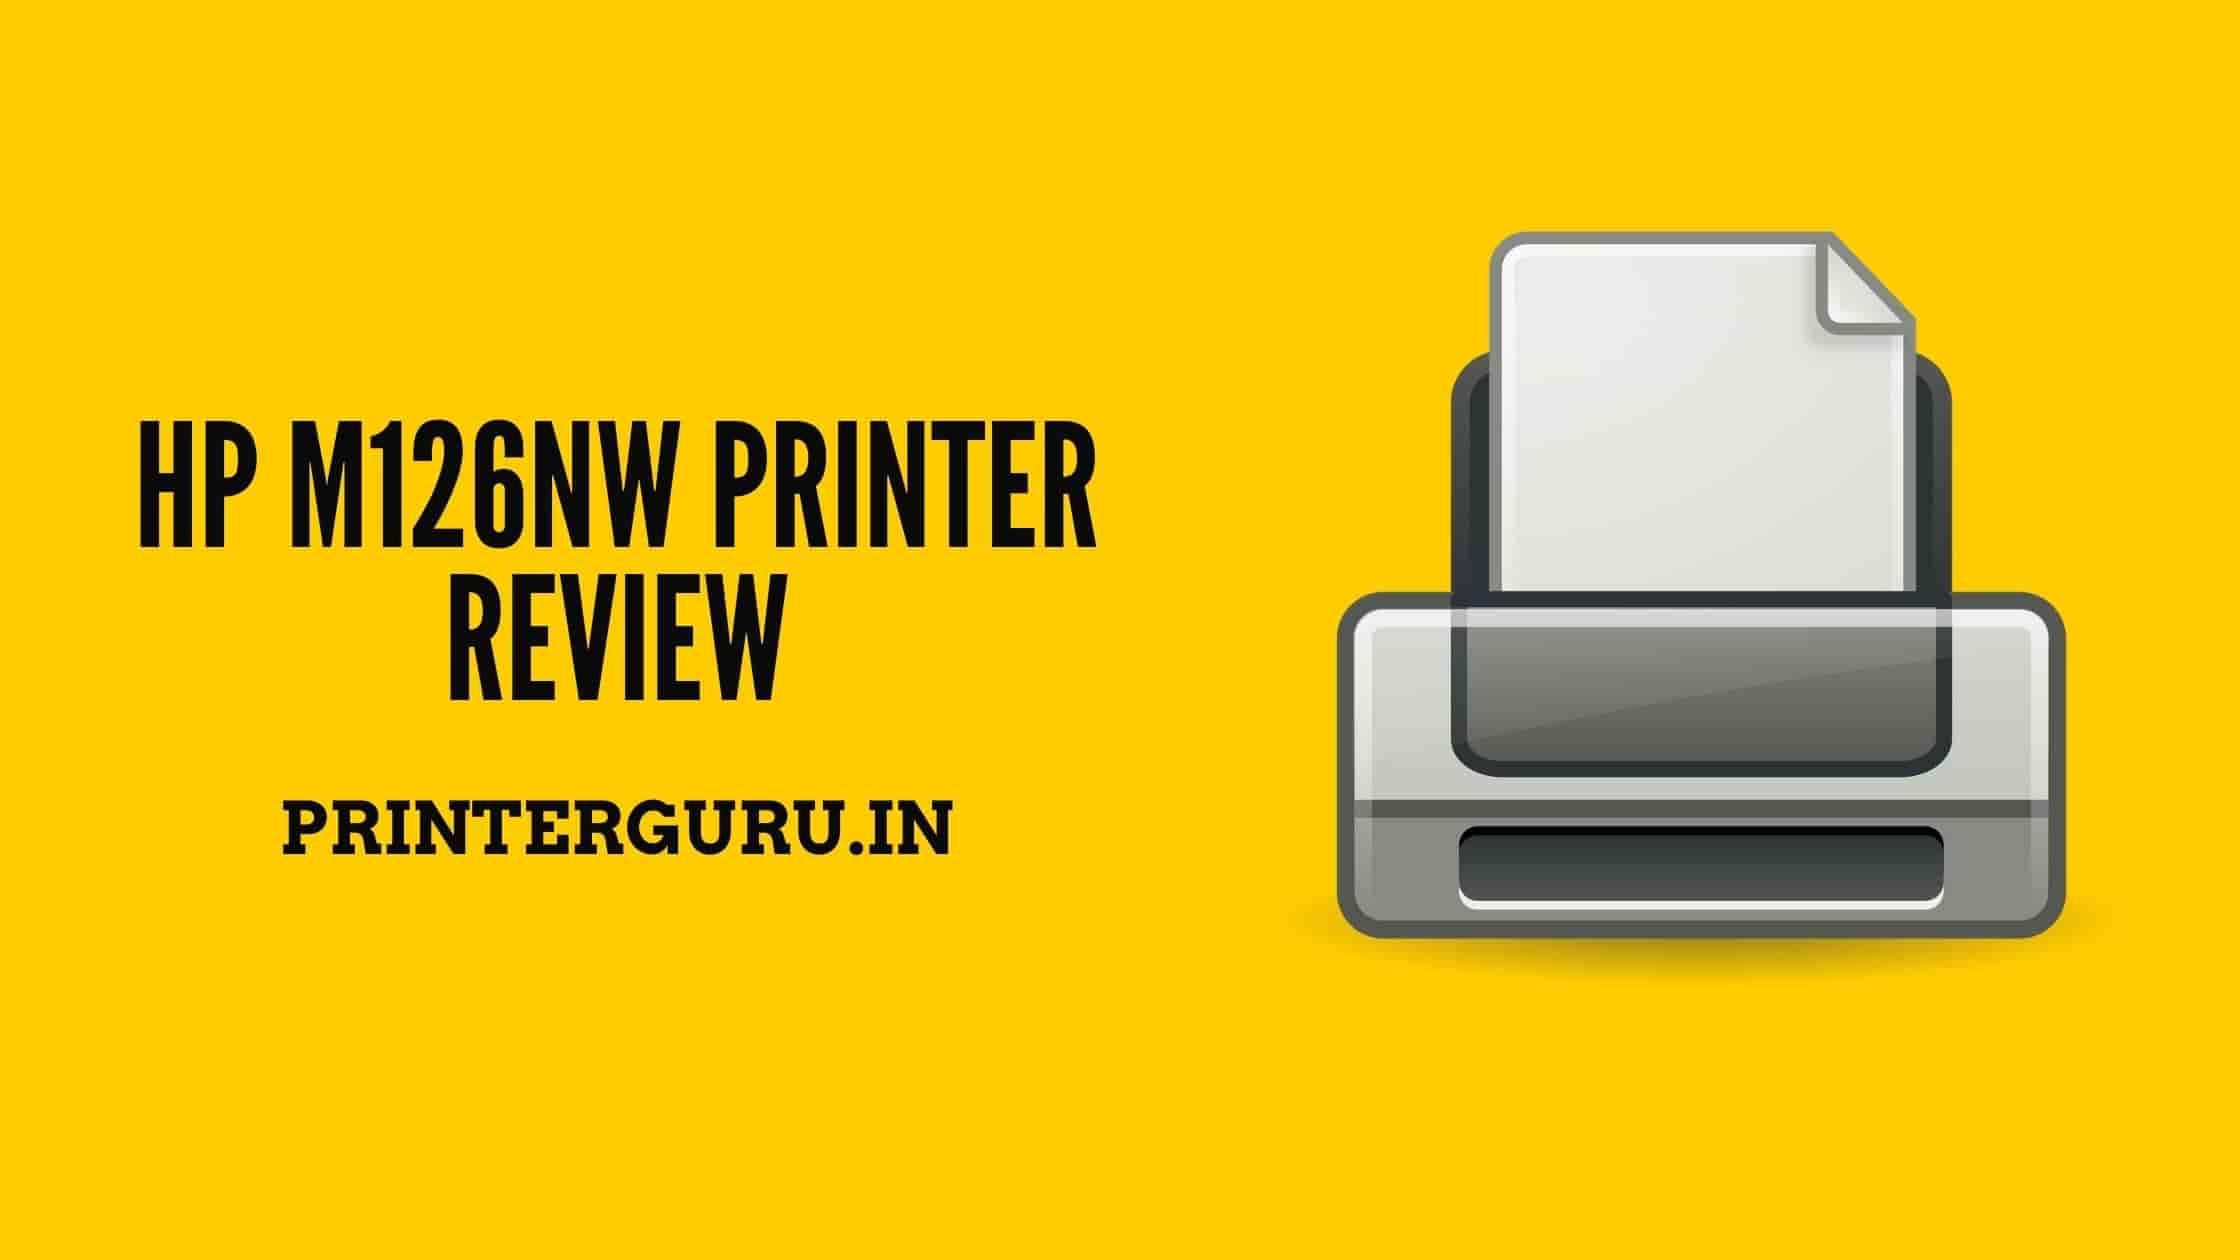 HP M126nw Printer Review